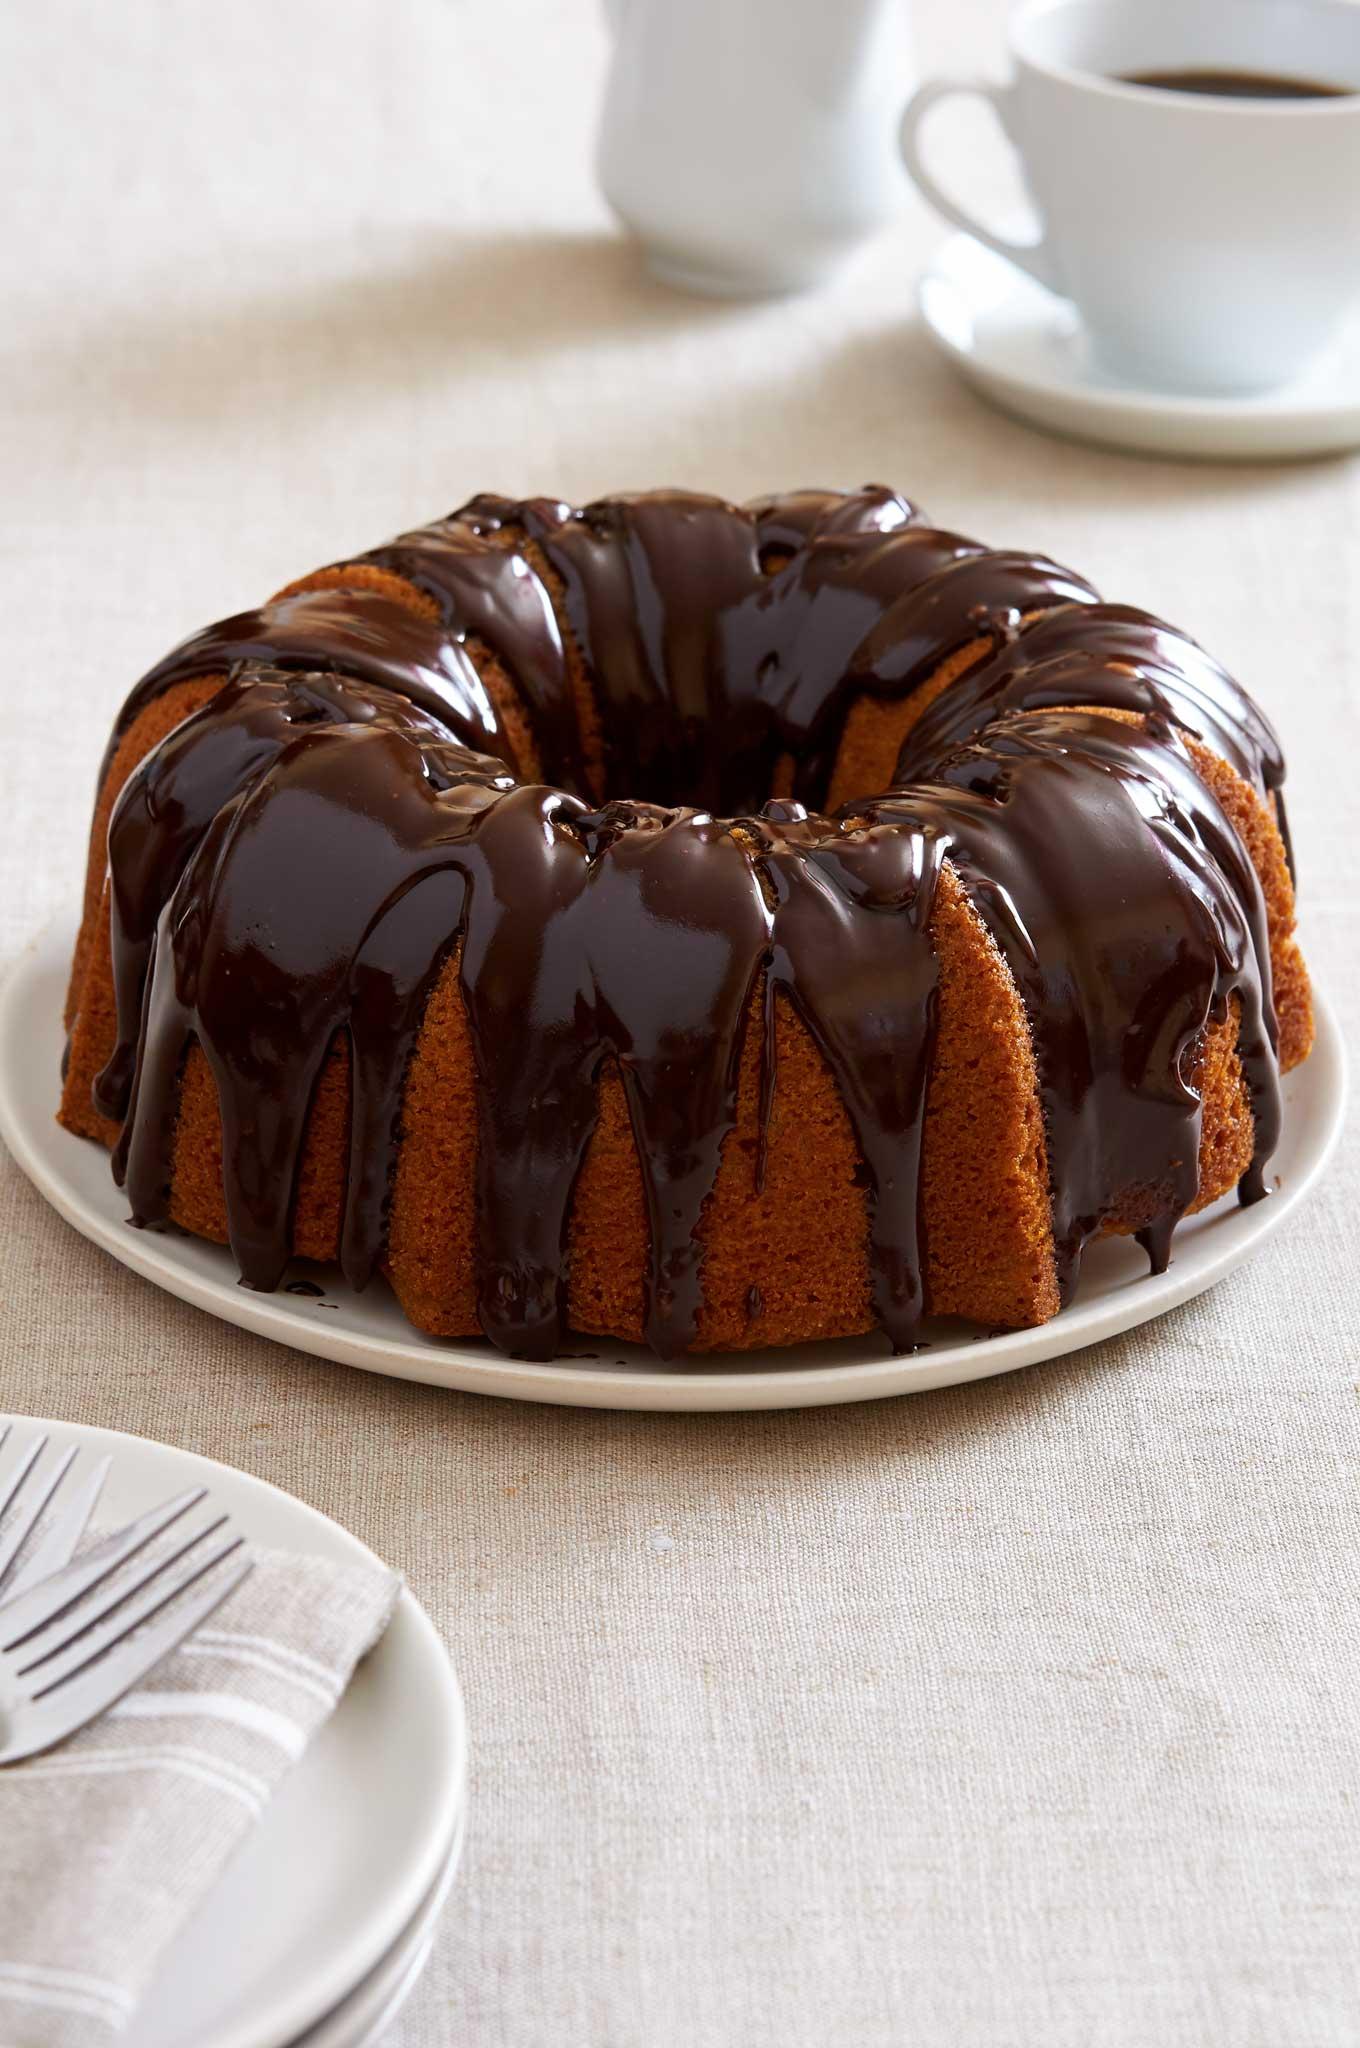 caramel-chocolate-chip-bundt-cake-before